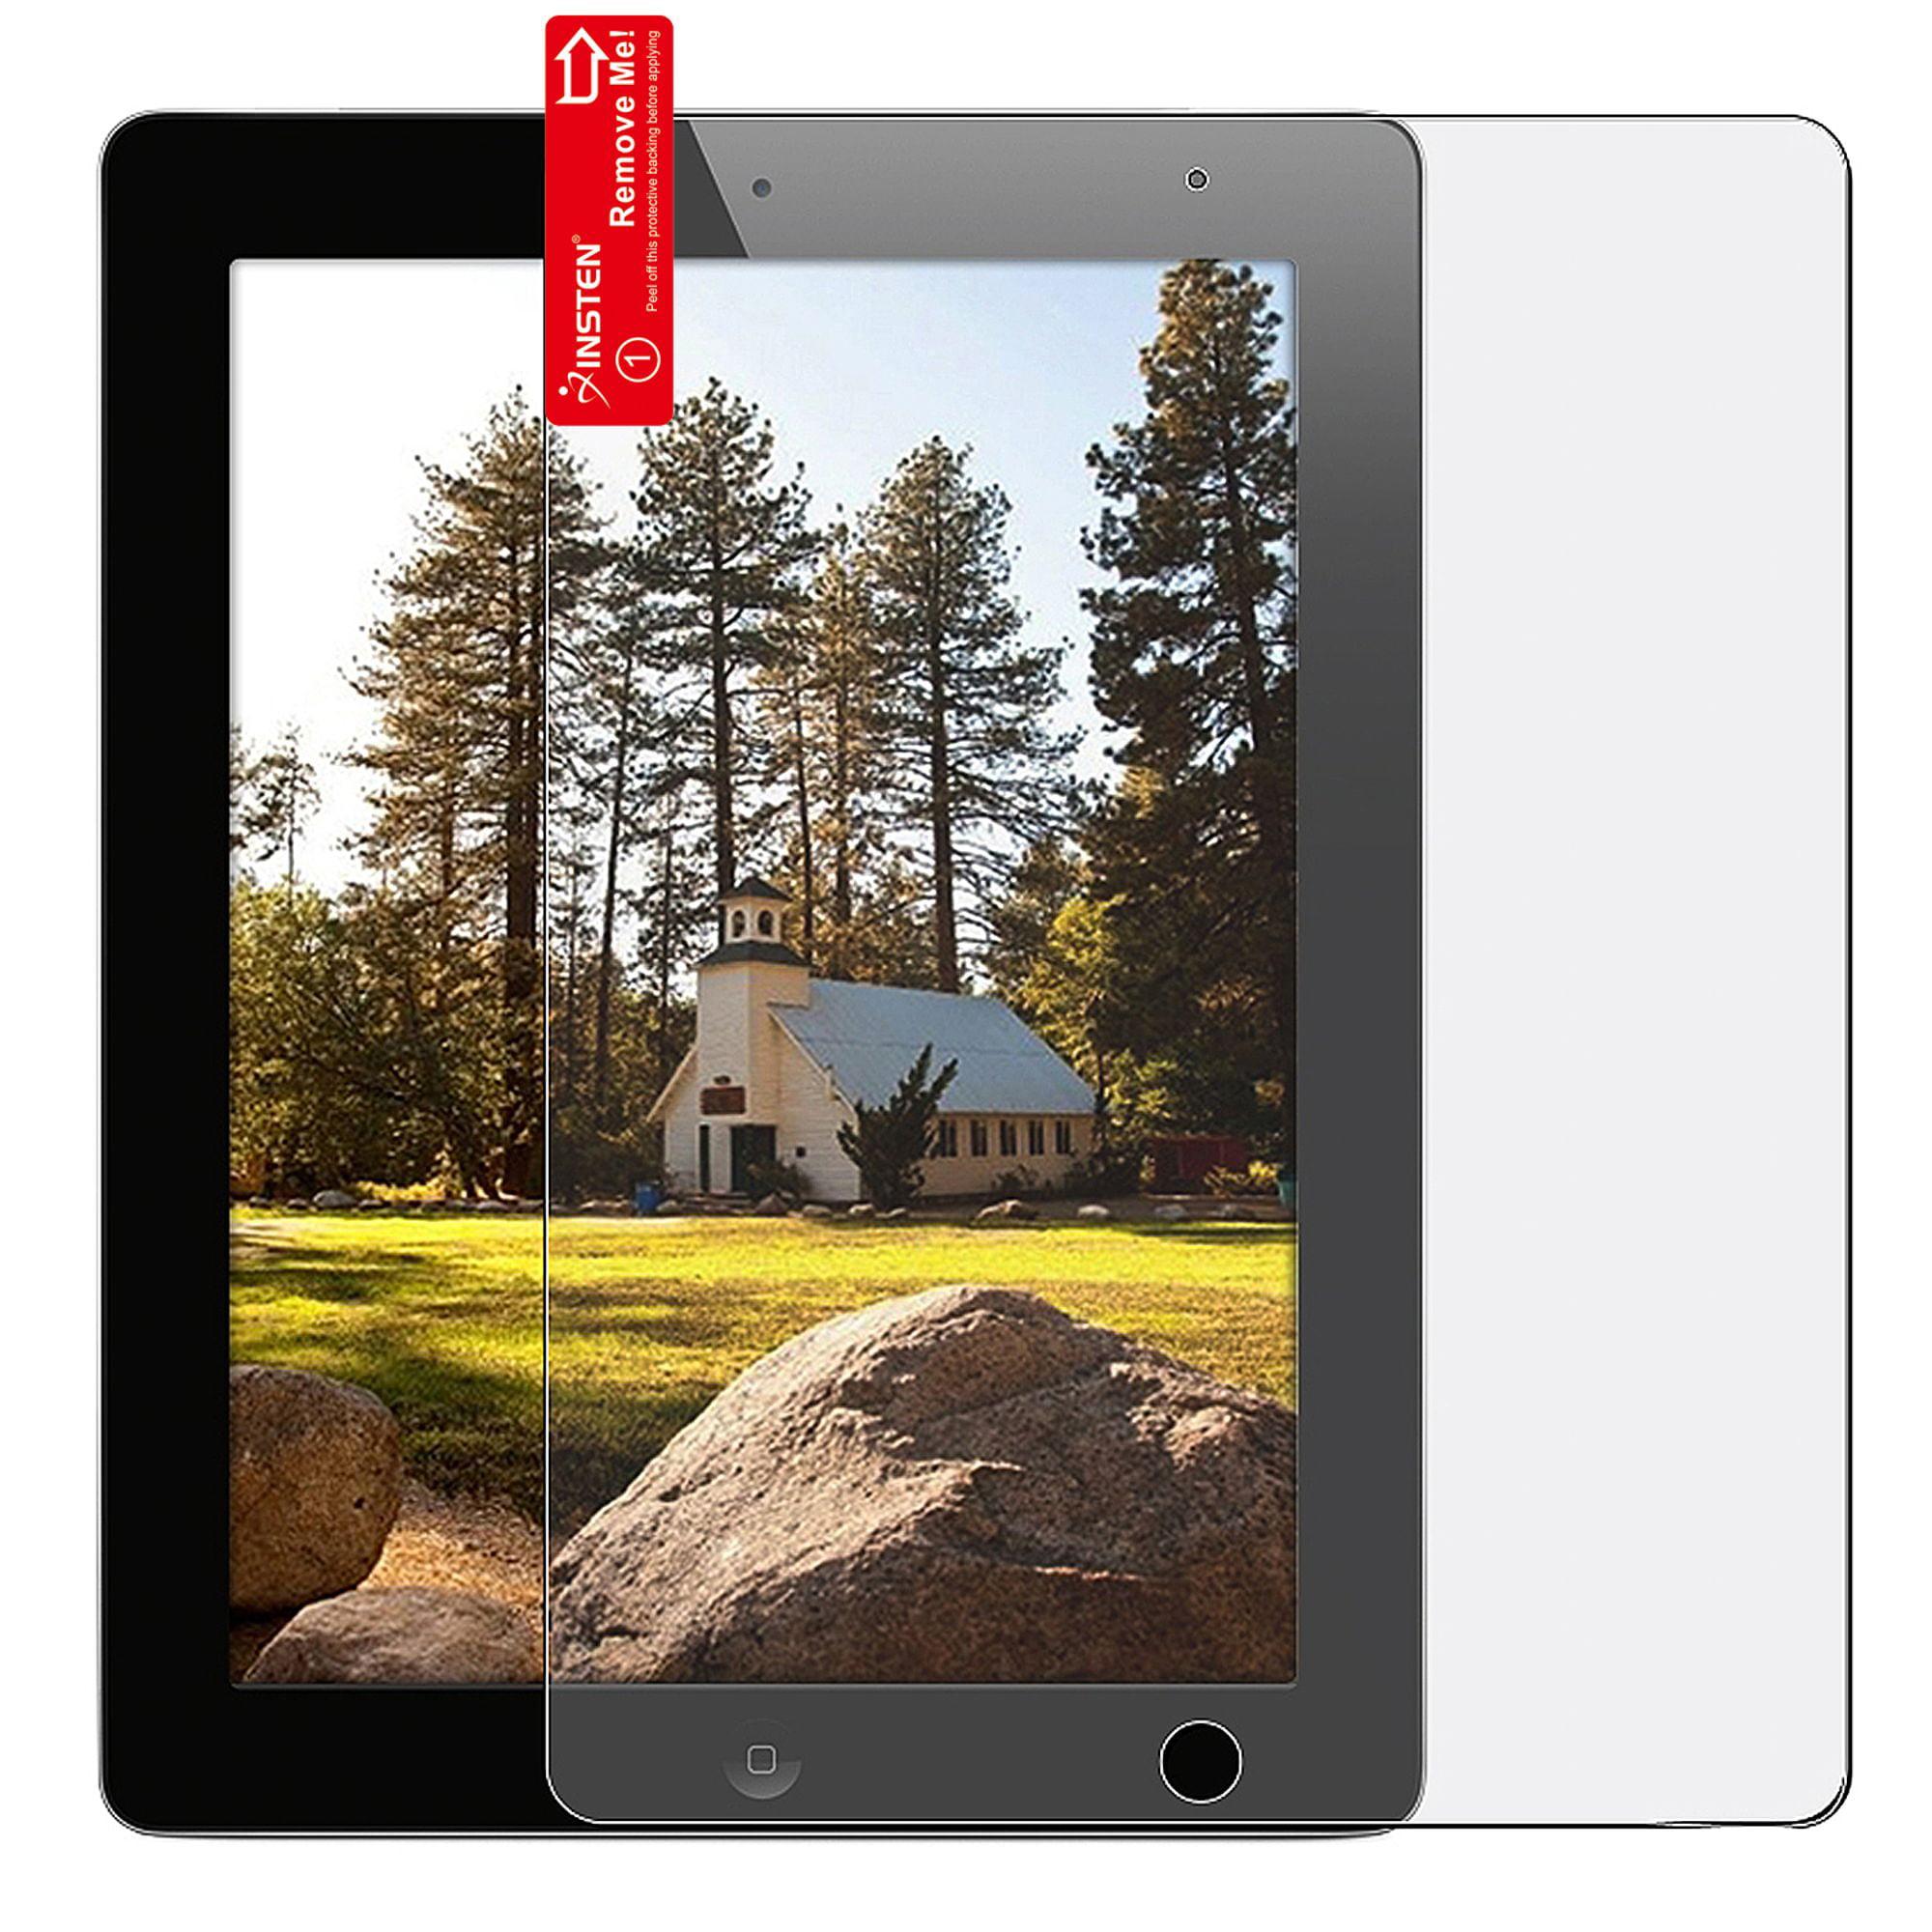 Insten Reusable Anti-Glare Screen Protector For Apple iPad 2 / 3 / 4